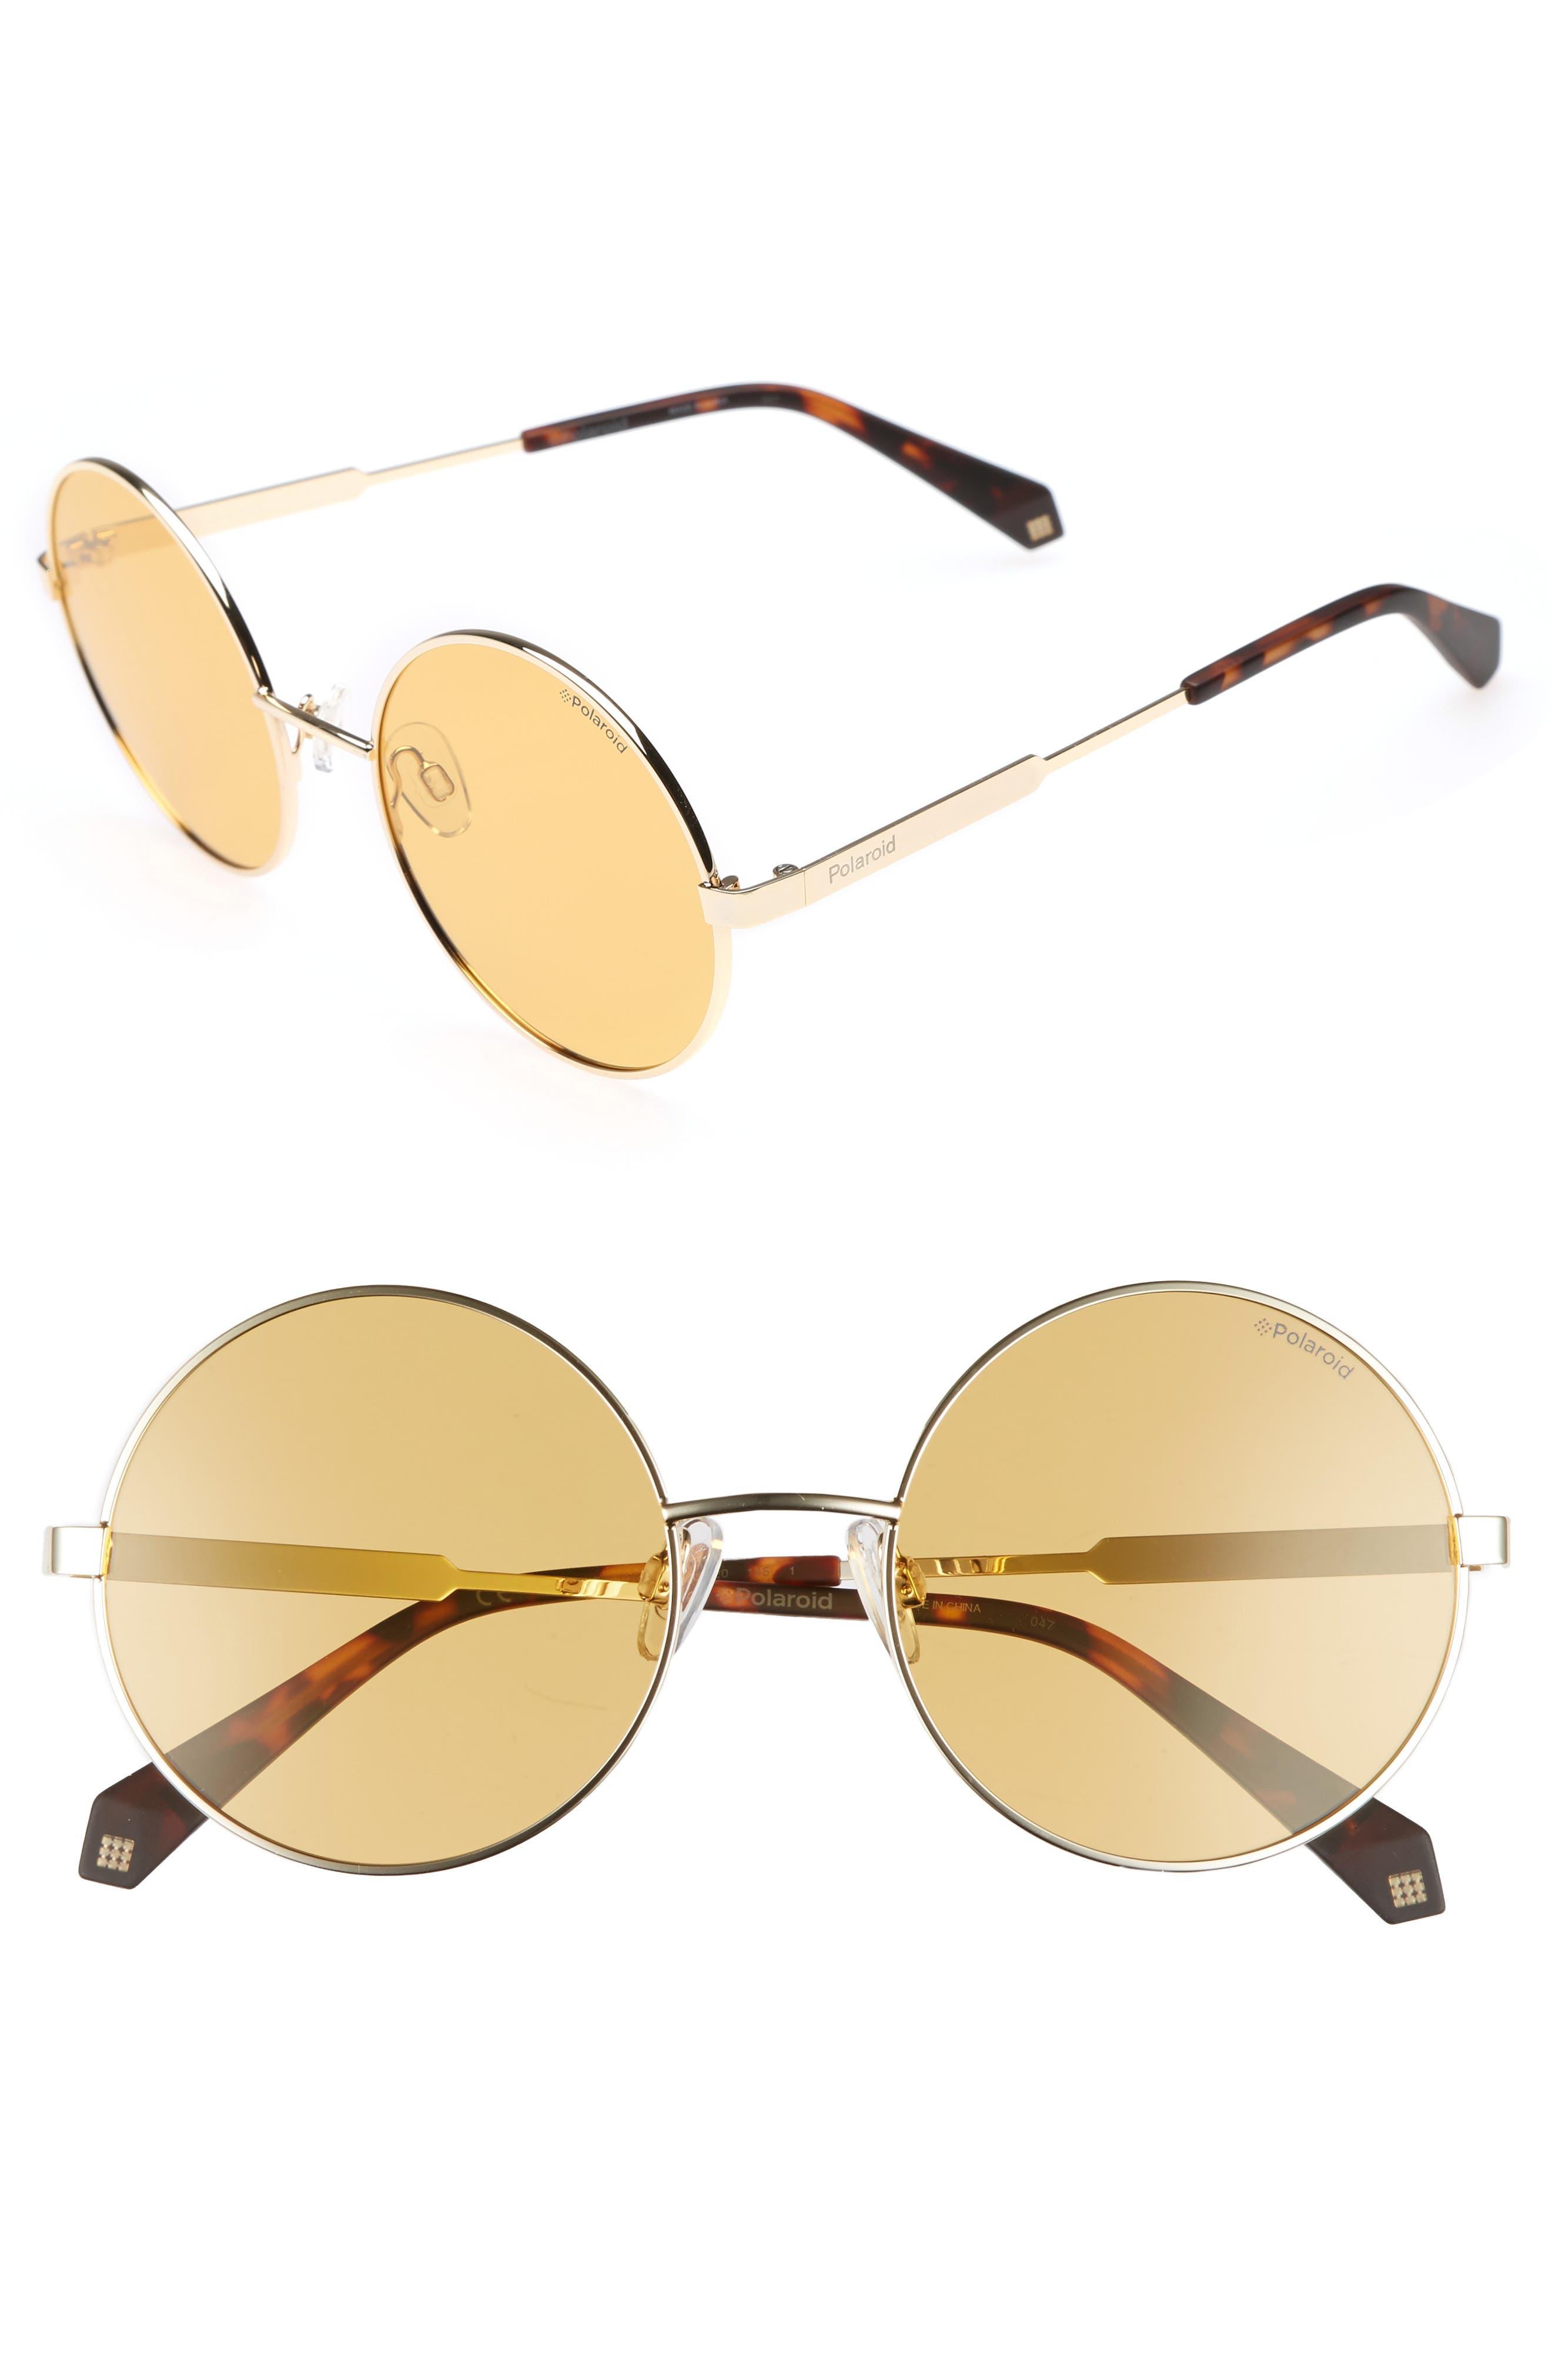 55mm Polarized Round Sunglasses,                             Main thumbnail 4, color,